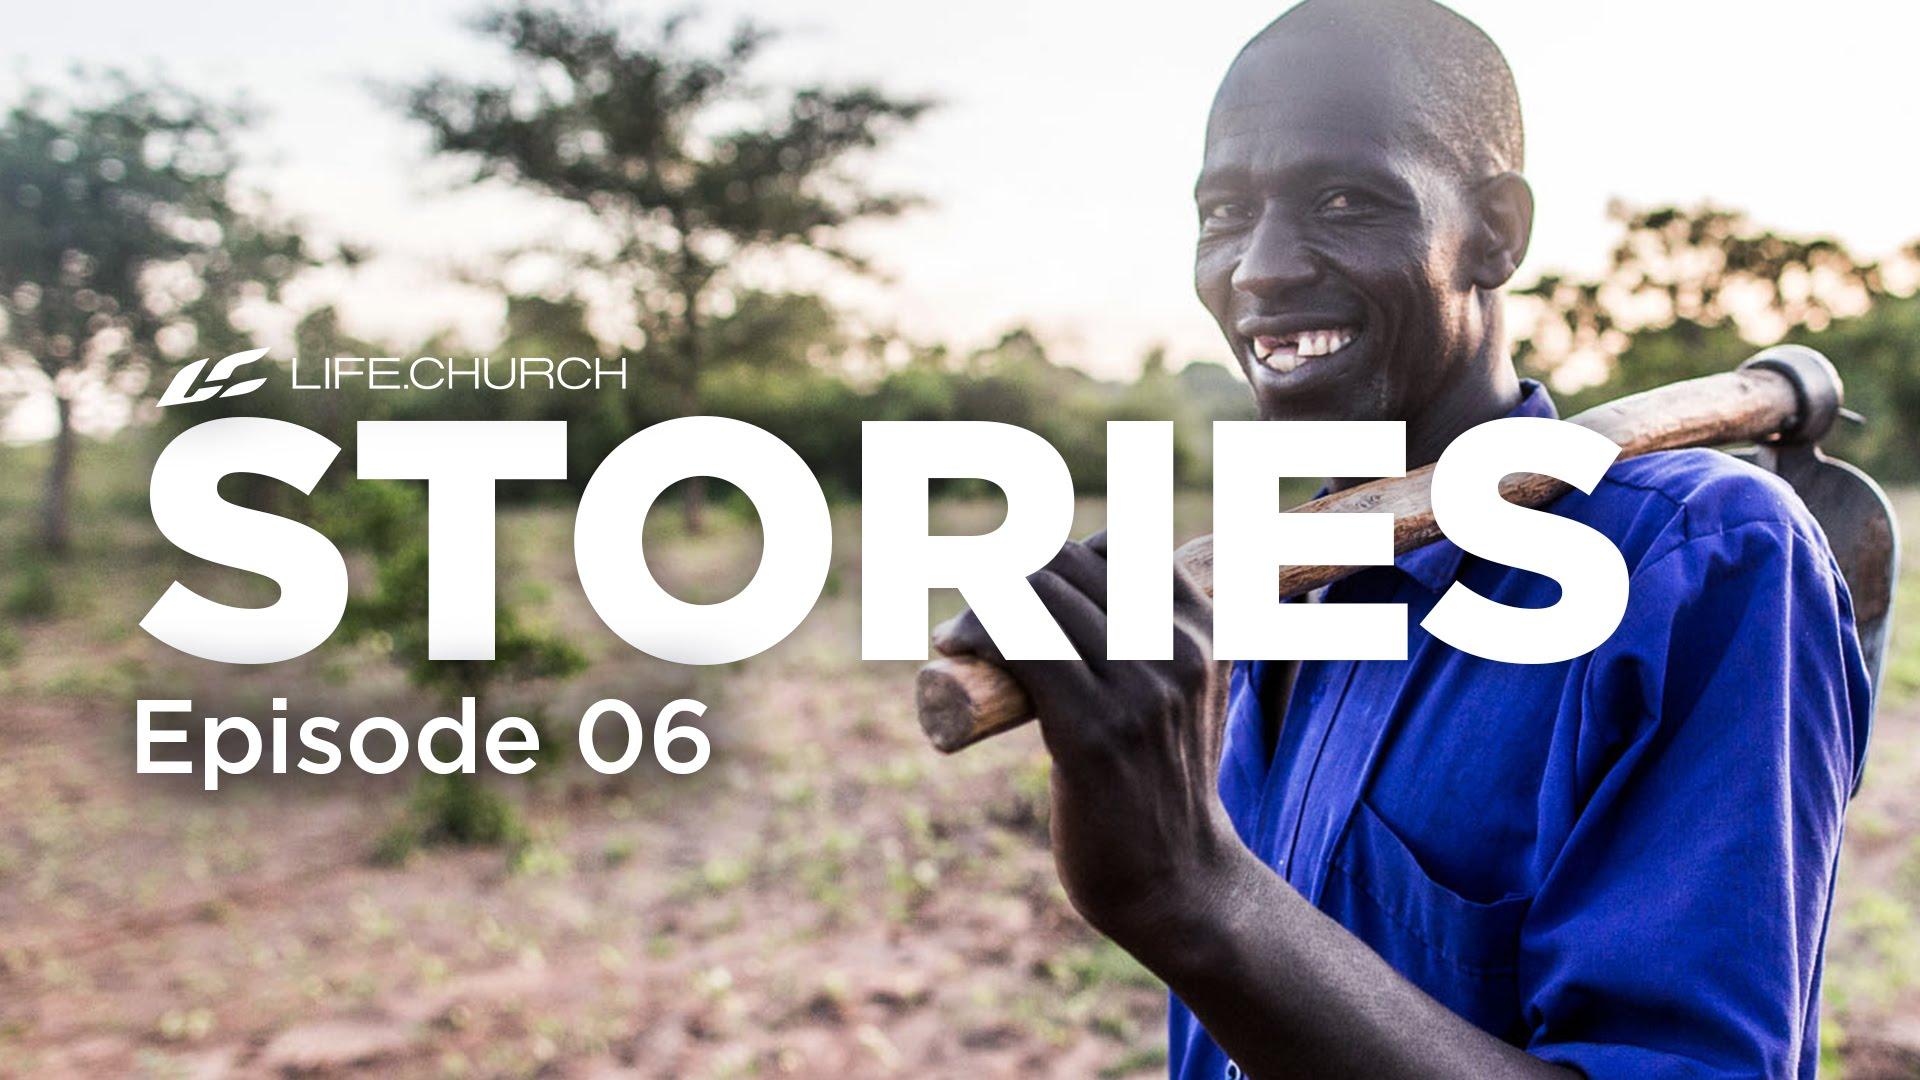 Episode 06 thumbnail